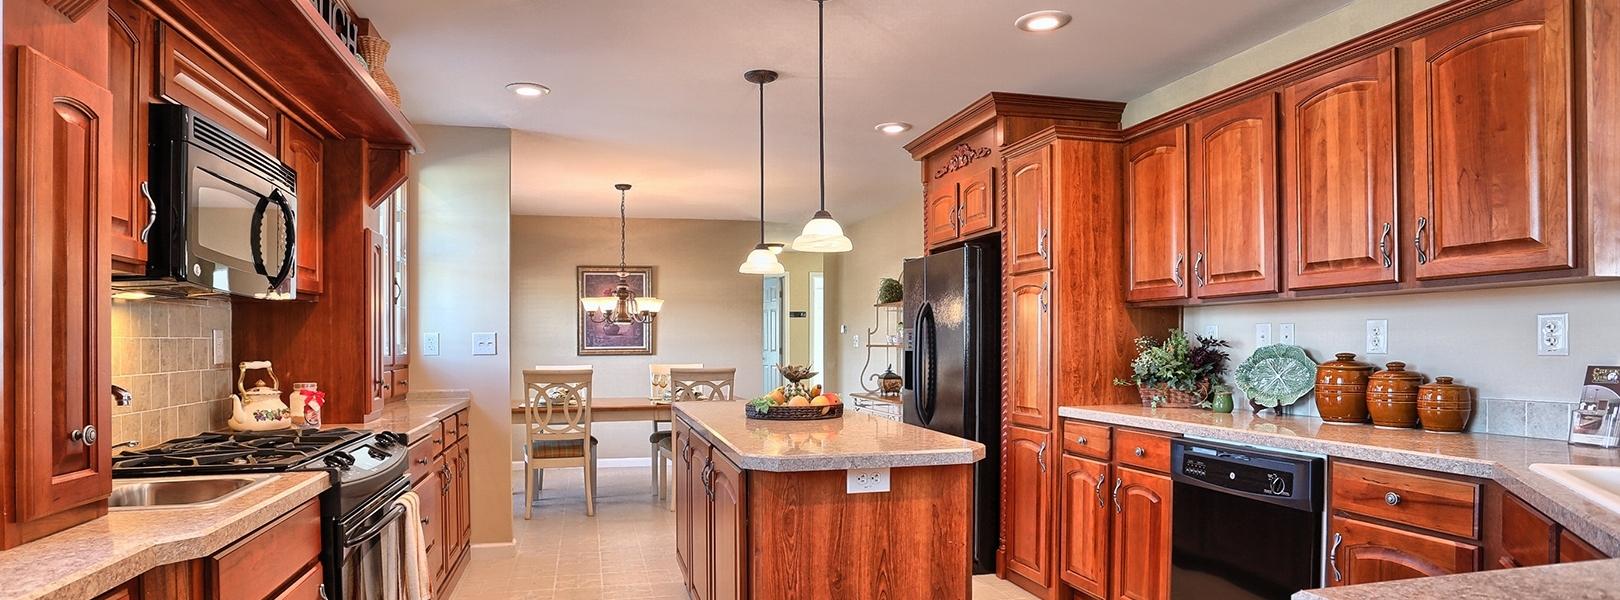 Hearth Wall Kitchen